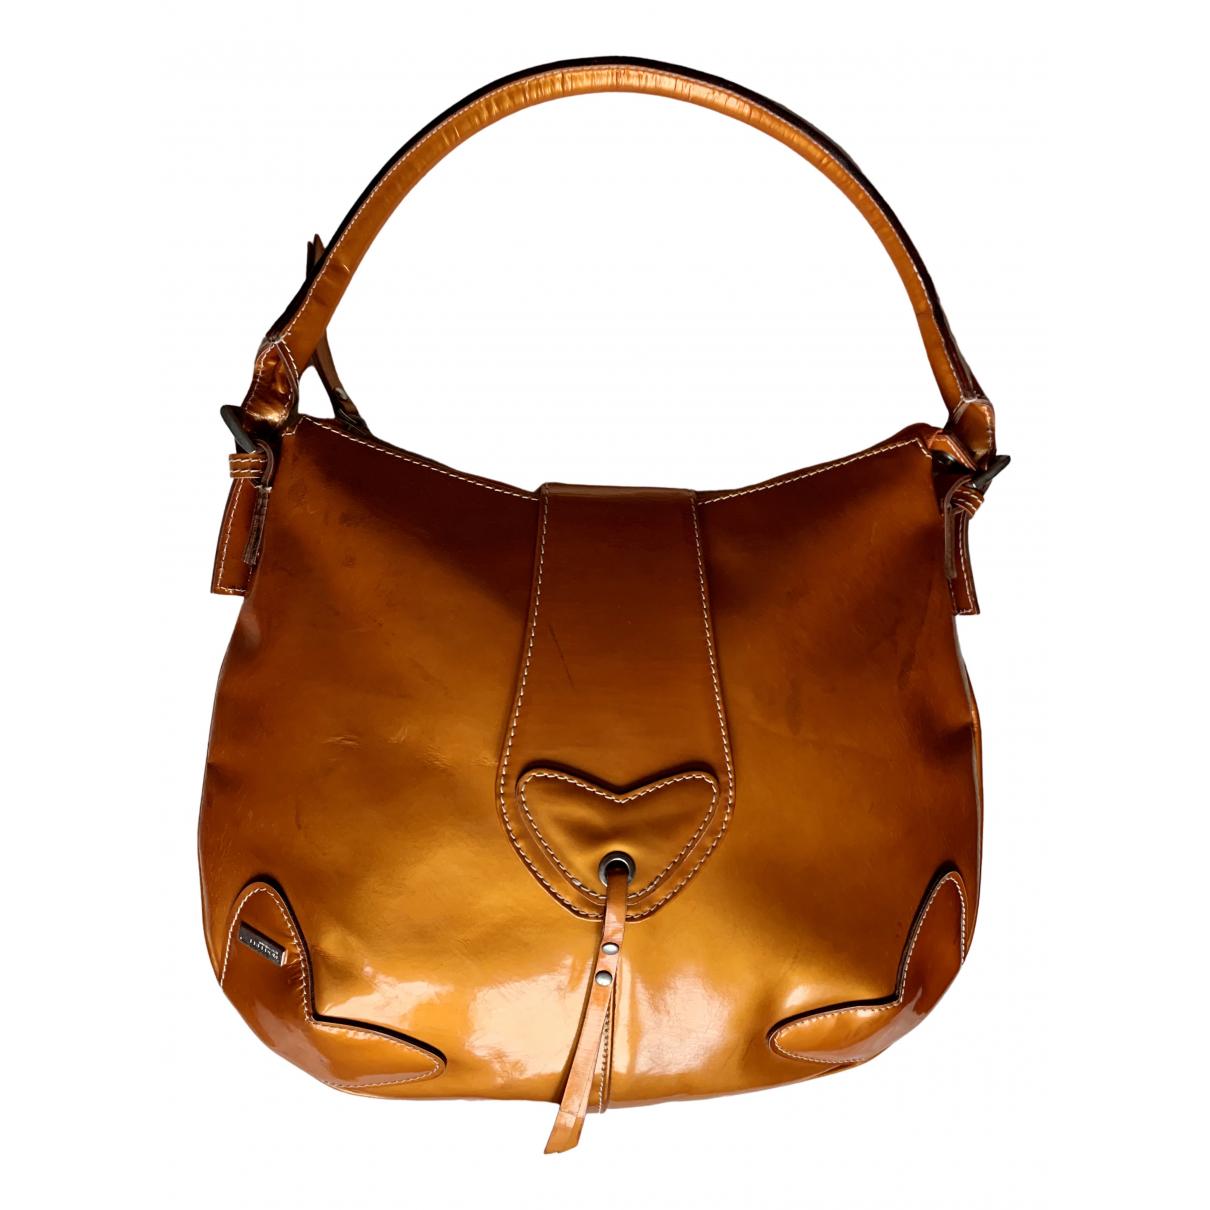 Roberto Cavalli N Orange Patent leather handbag for Women N